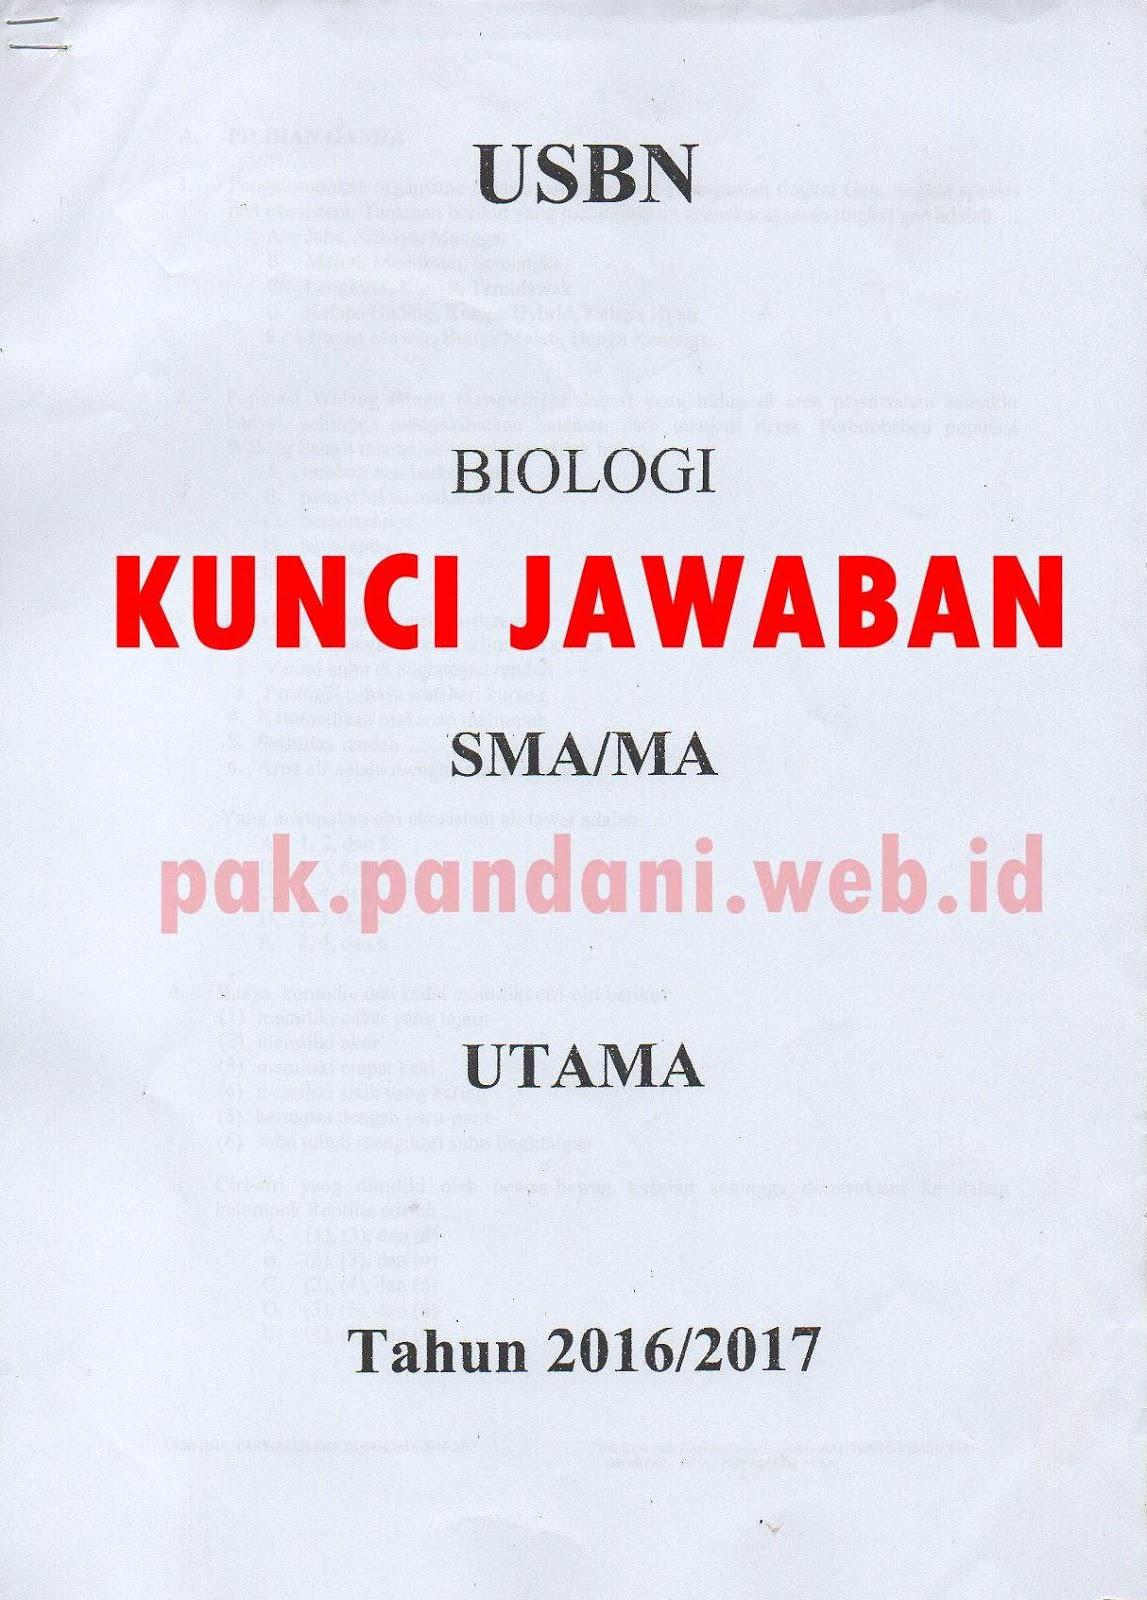 Kunci Jawaban Soal Usbn Biologi Sma Tahun Pelajaran 2016 2017 Blog Pak Pandani